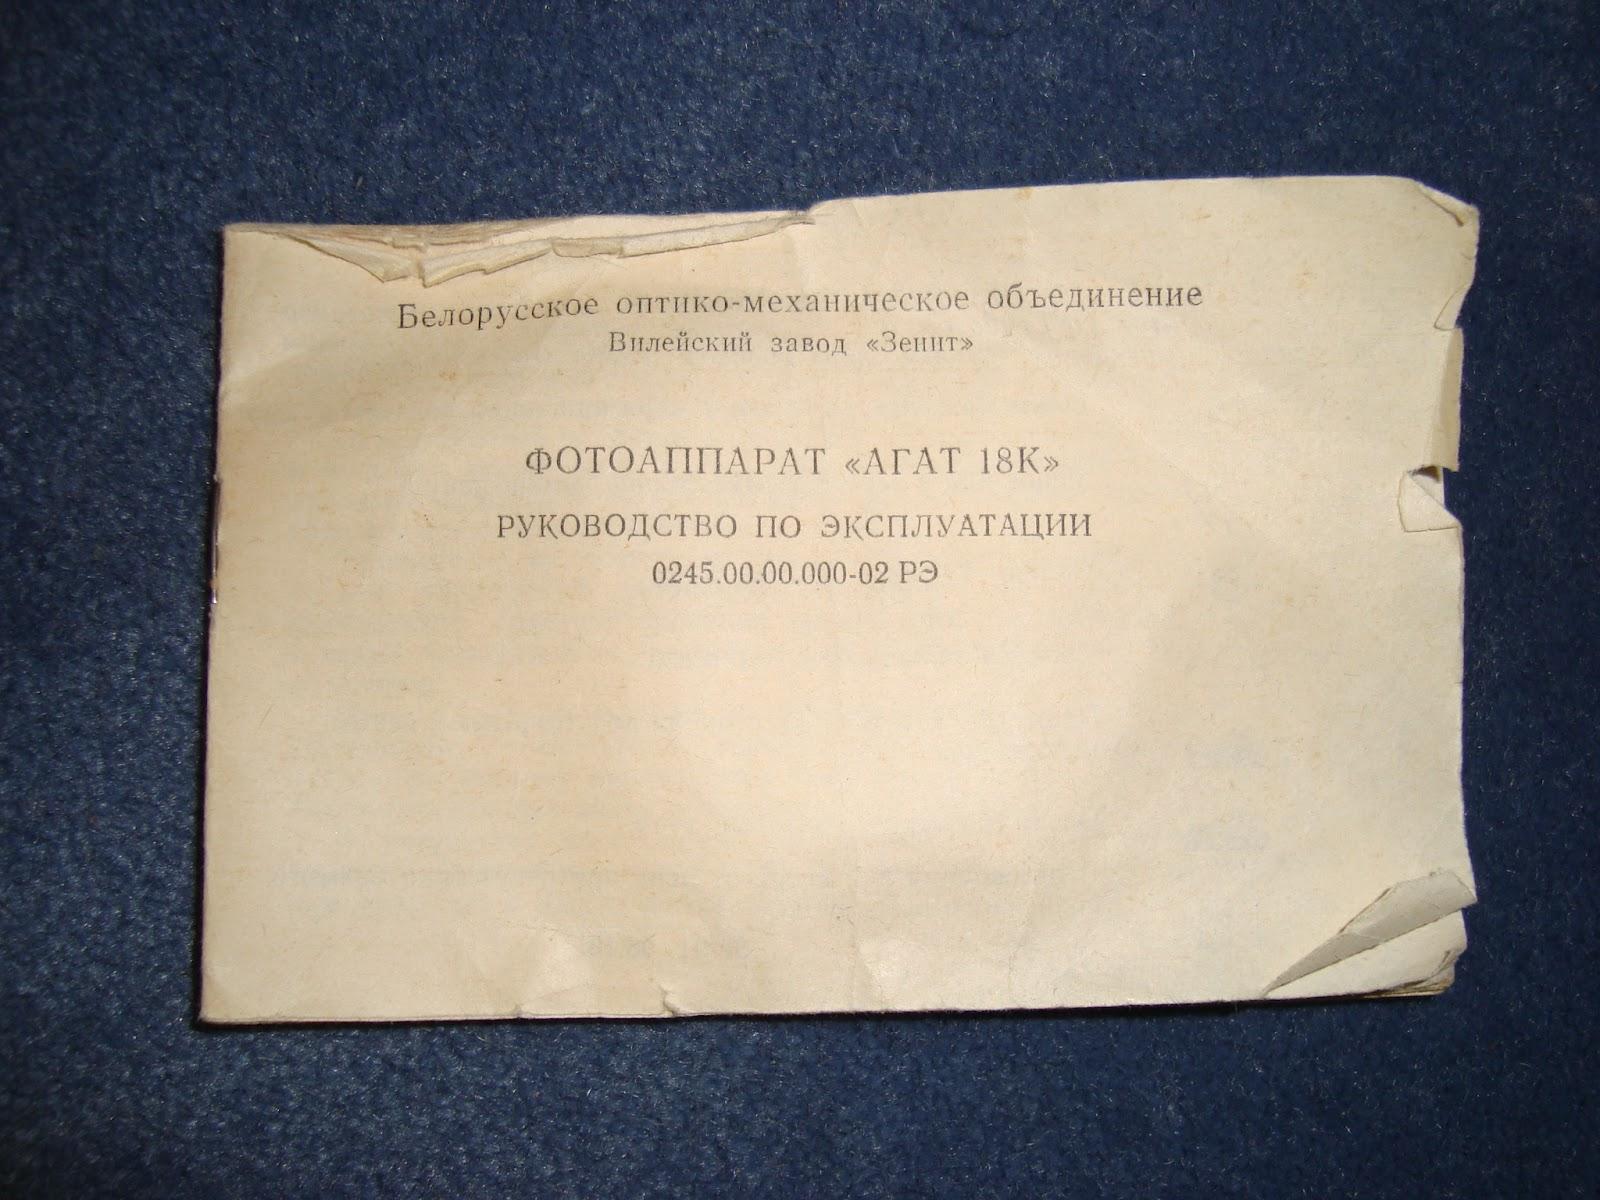 Agat 18k manual Pdf